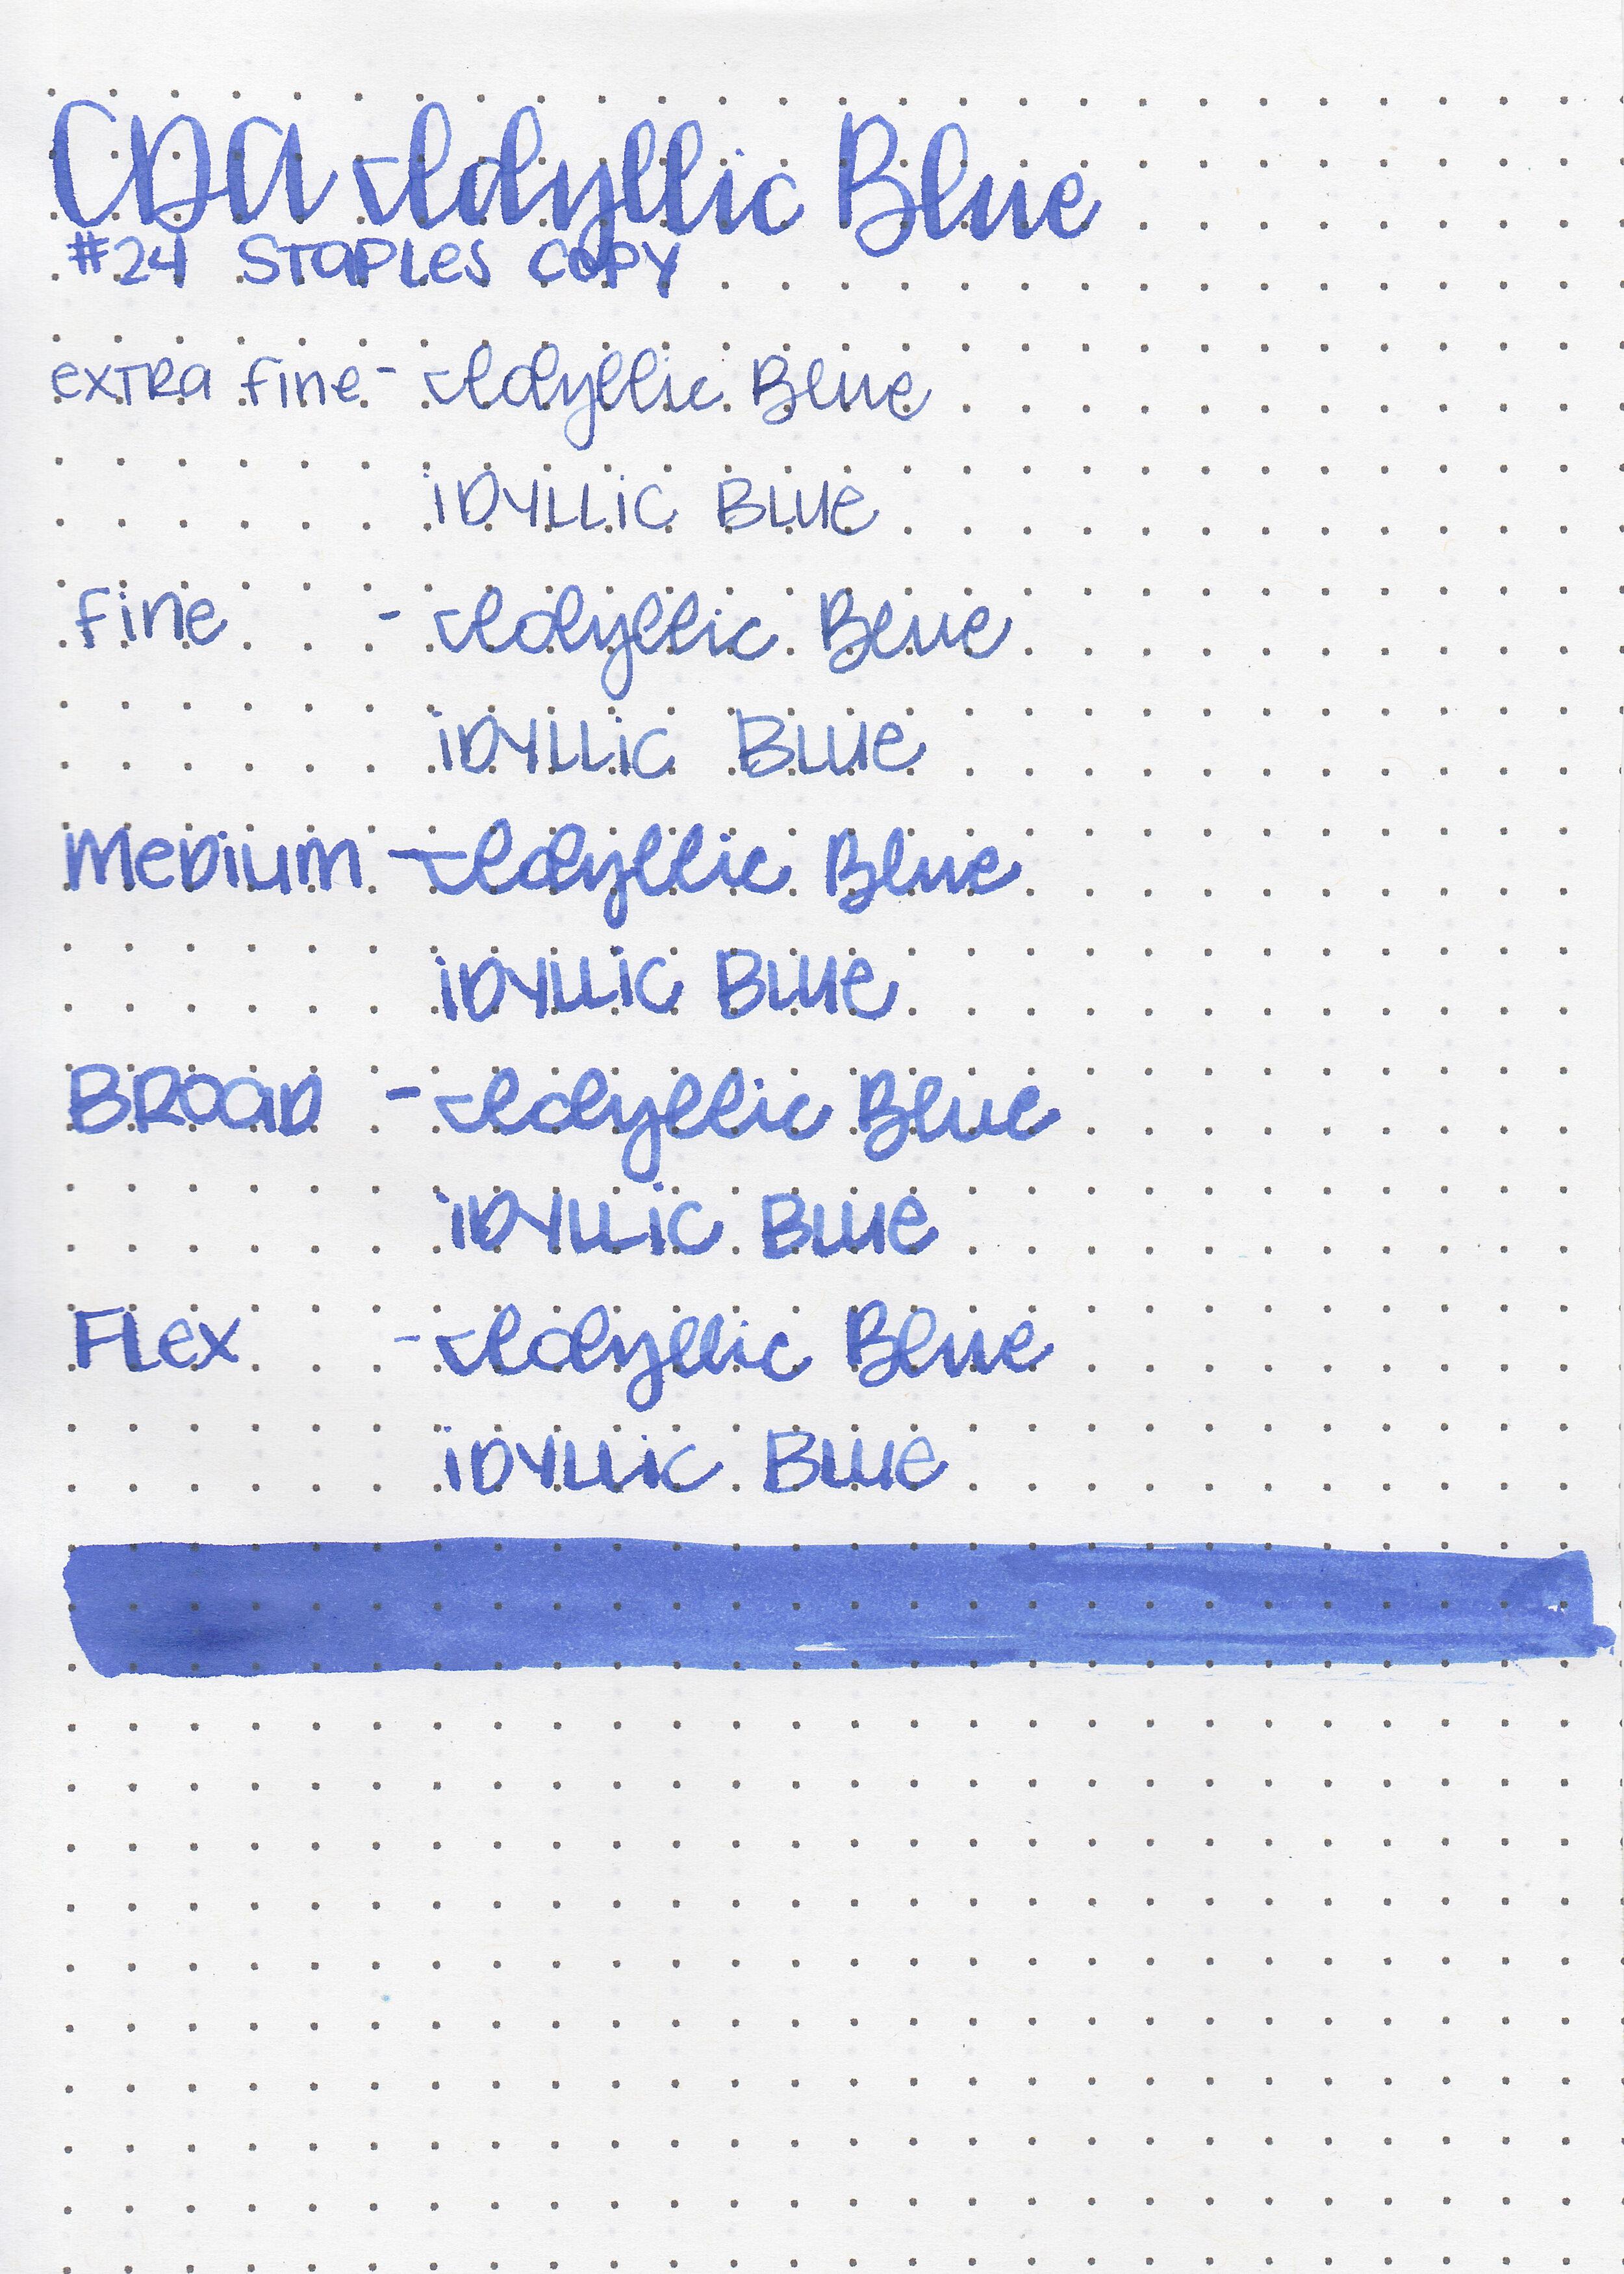 cda-idyllic-blue-11.jpg